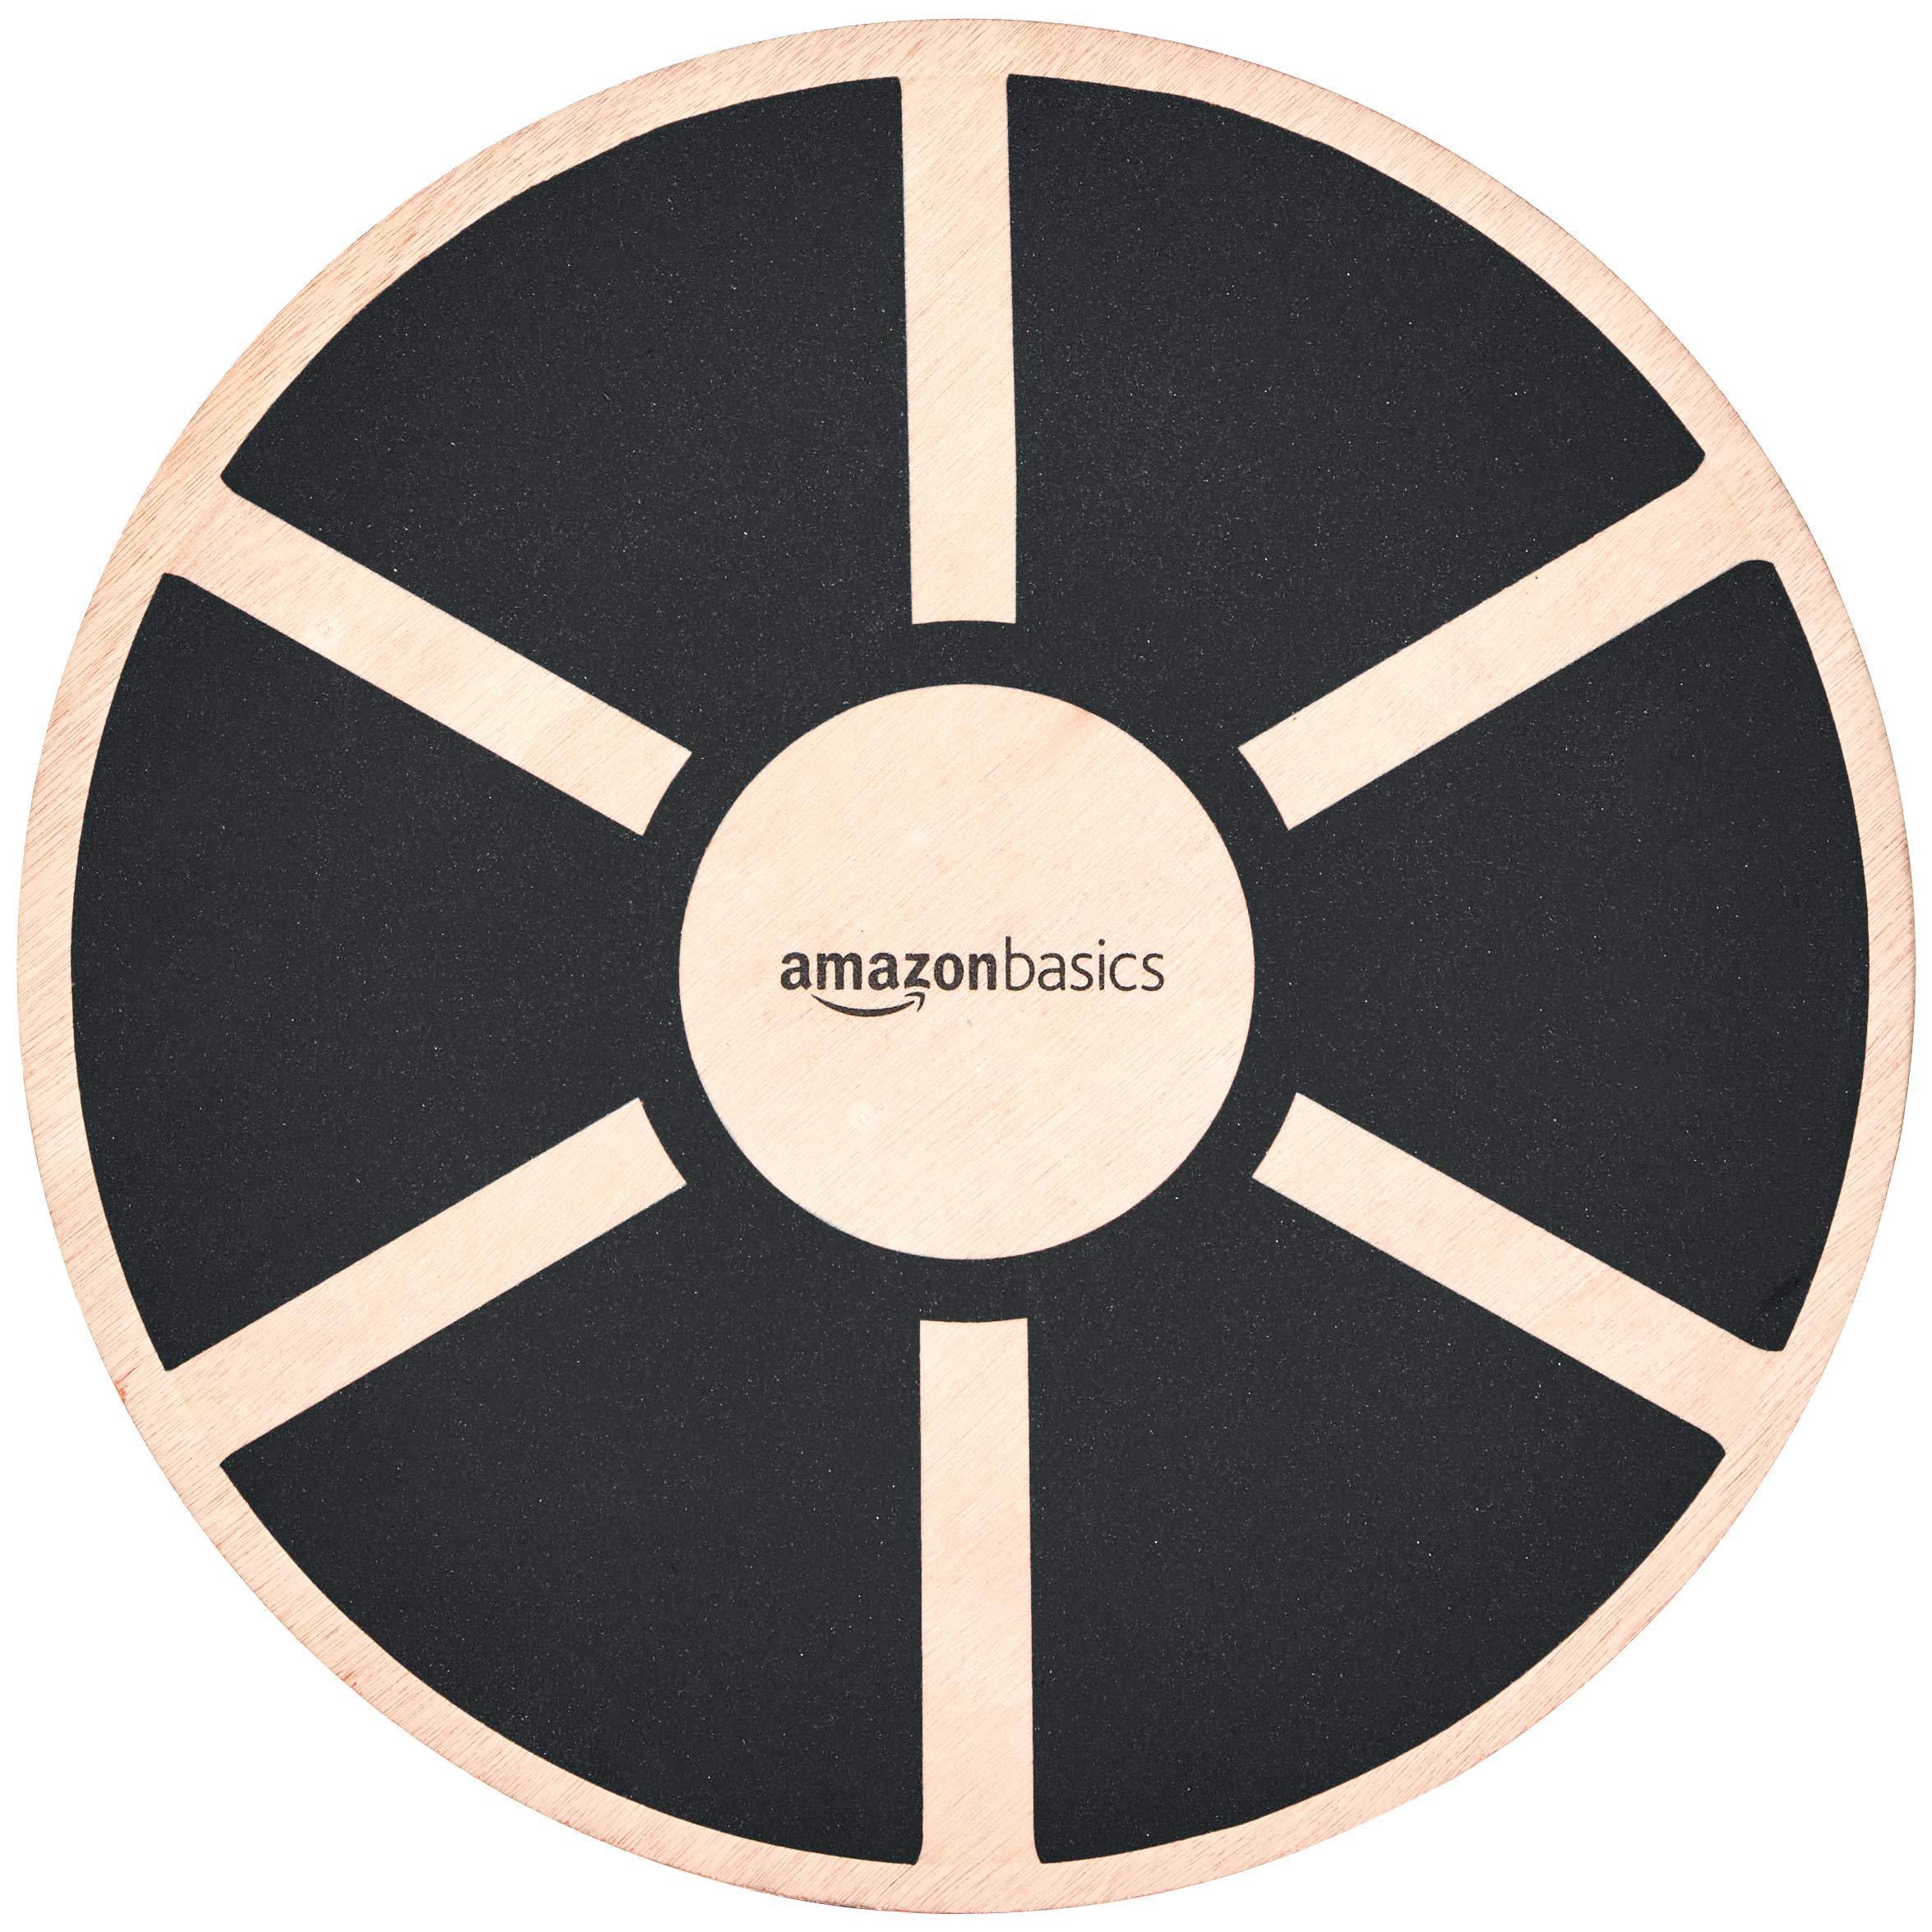 AmazonBasics Wobble Balance Board Black